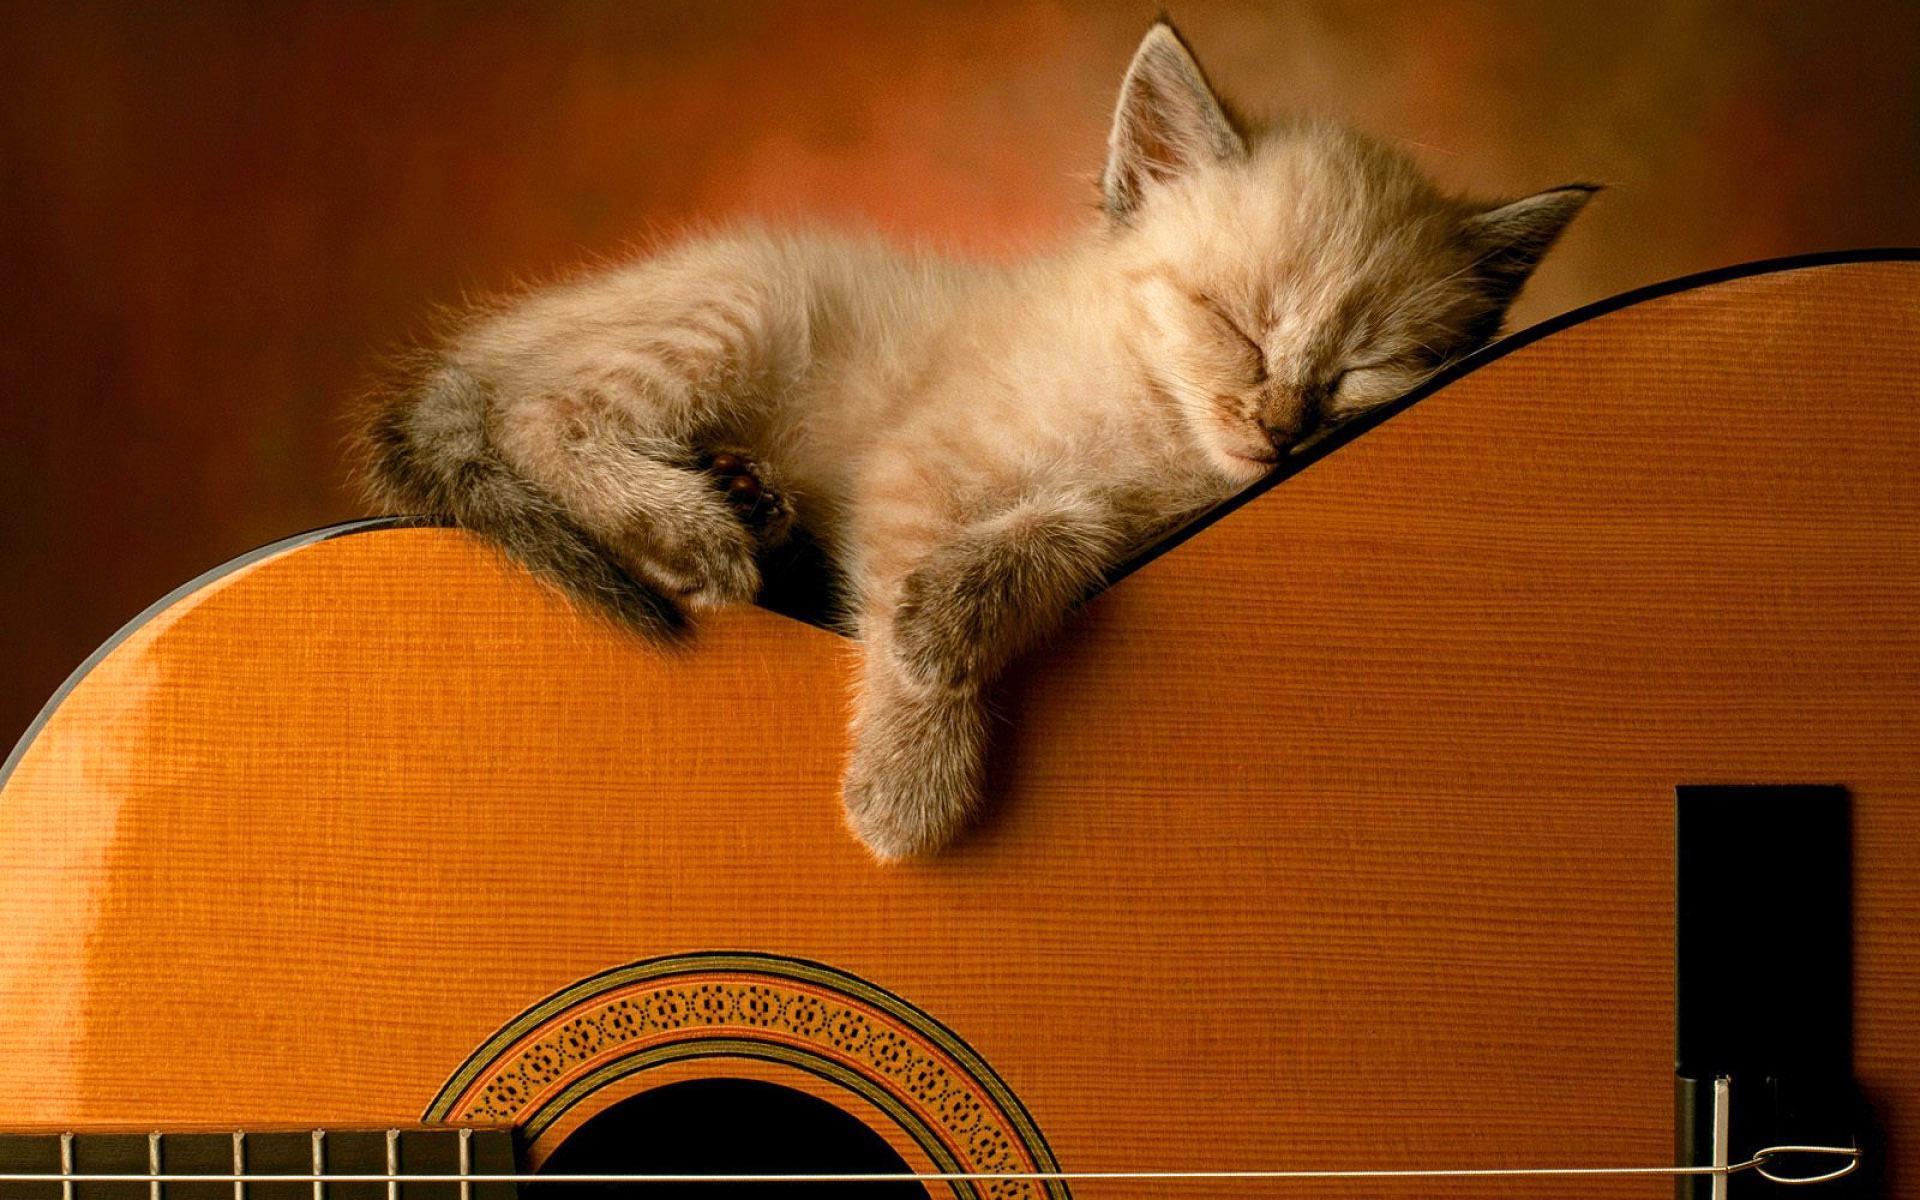 Kitty sleep on guitar